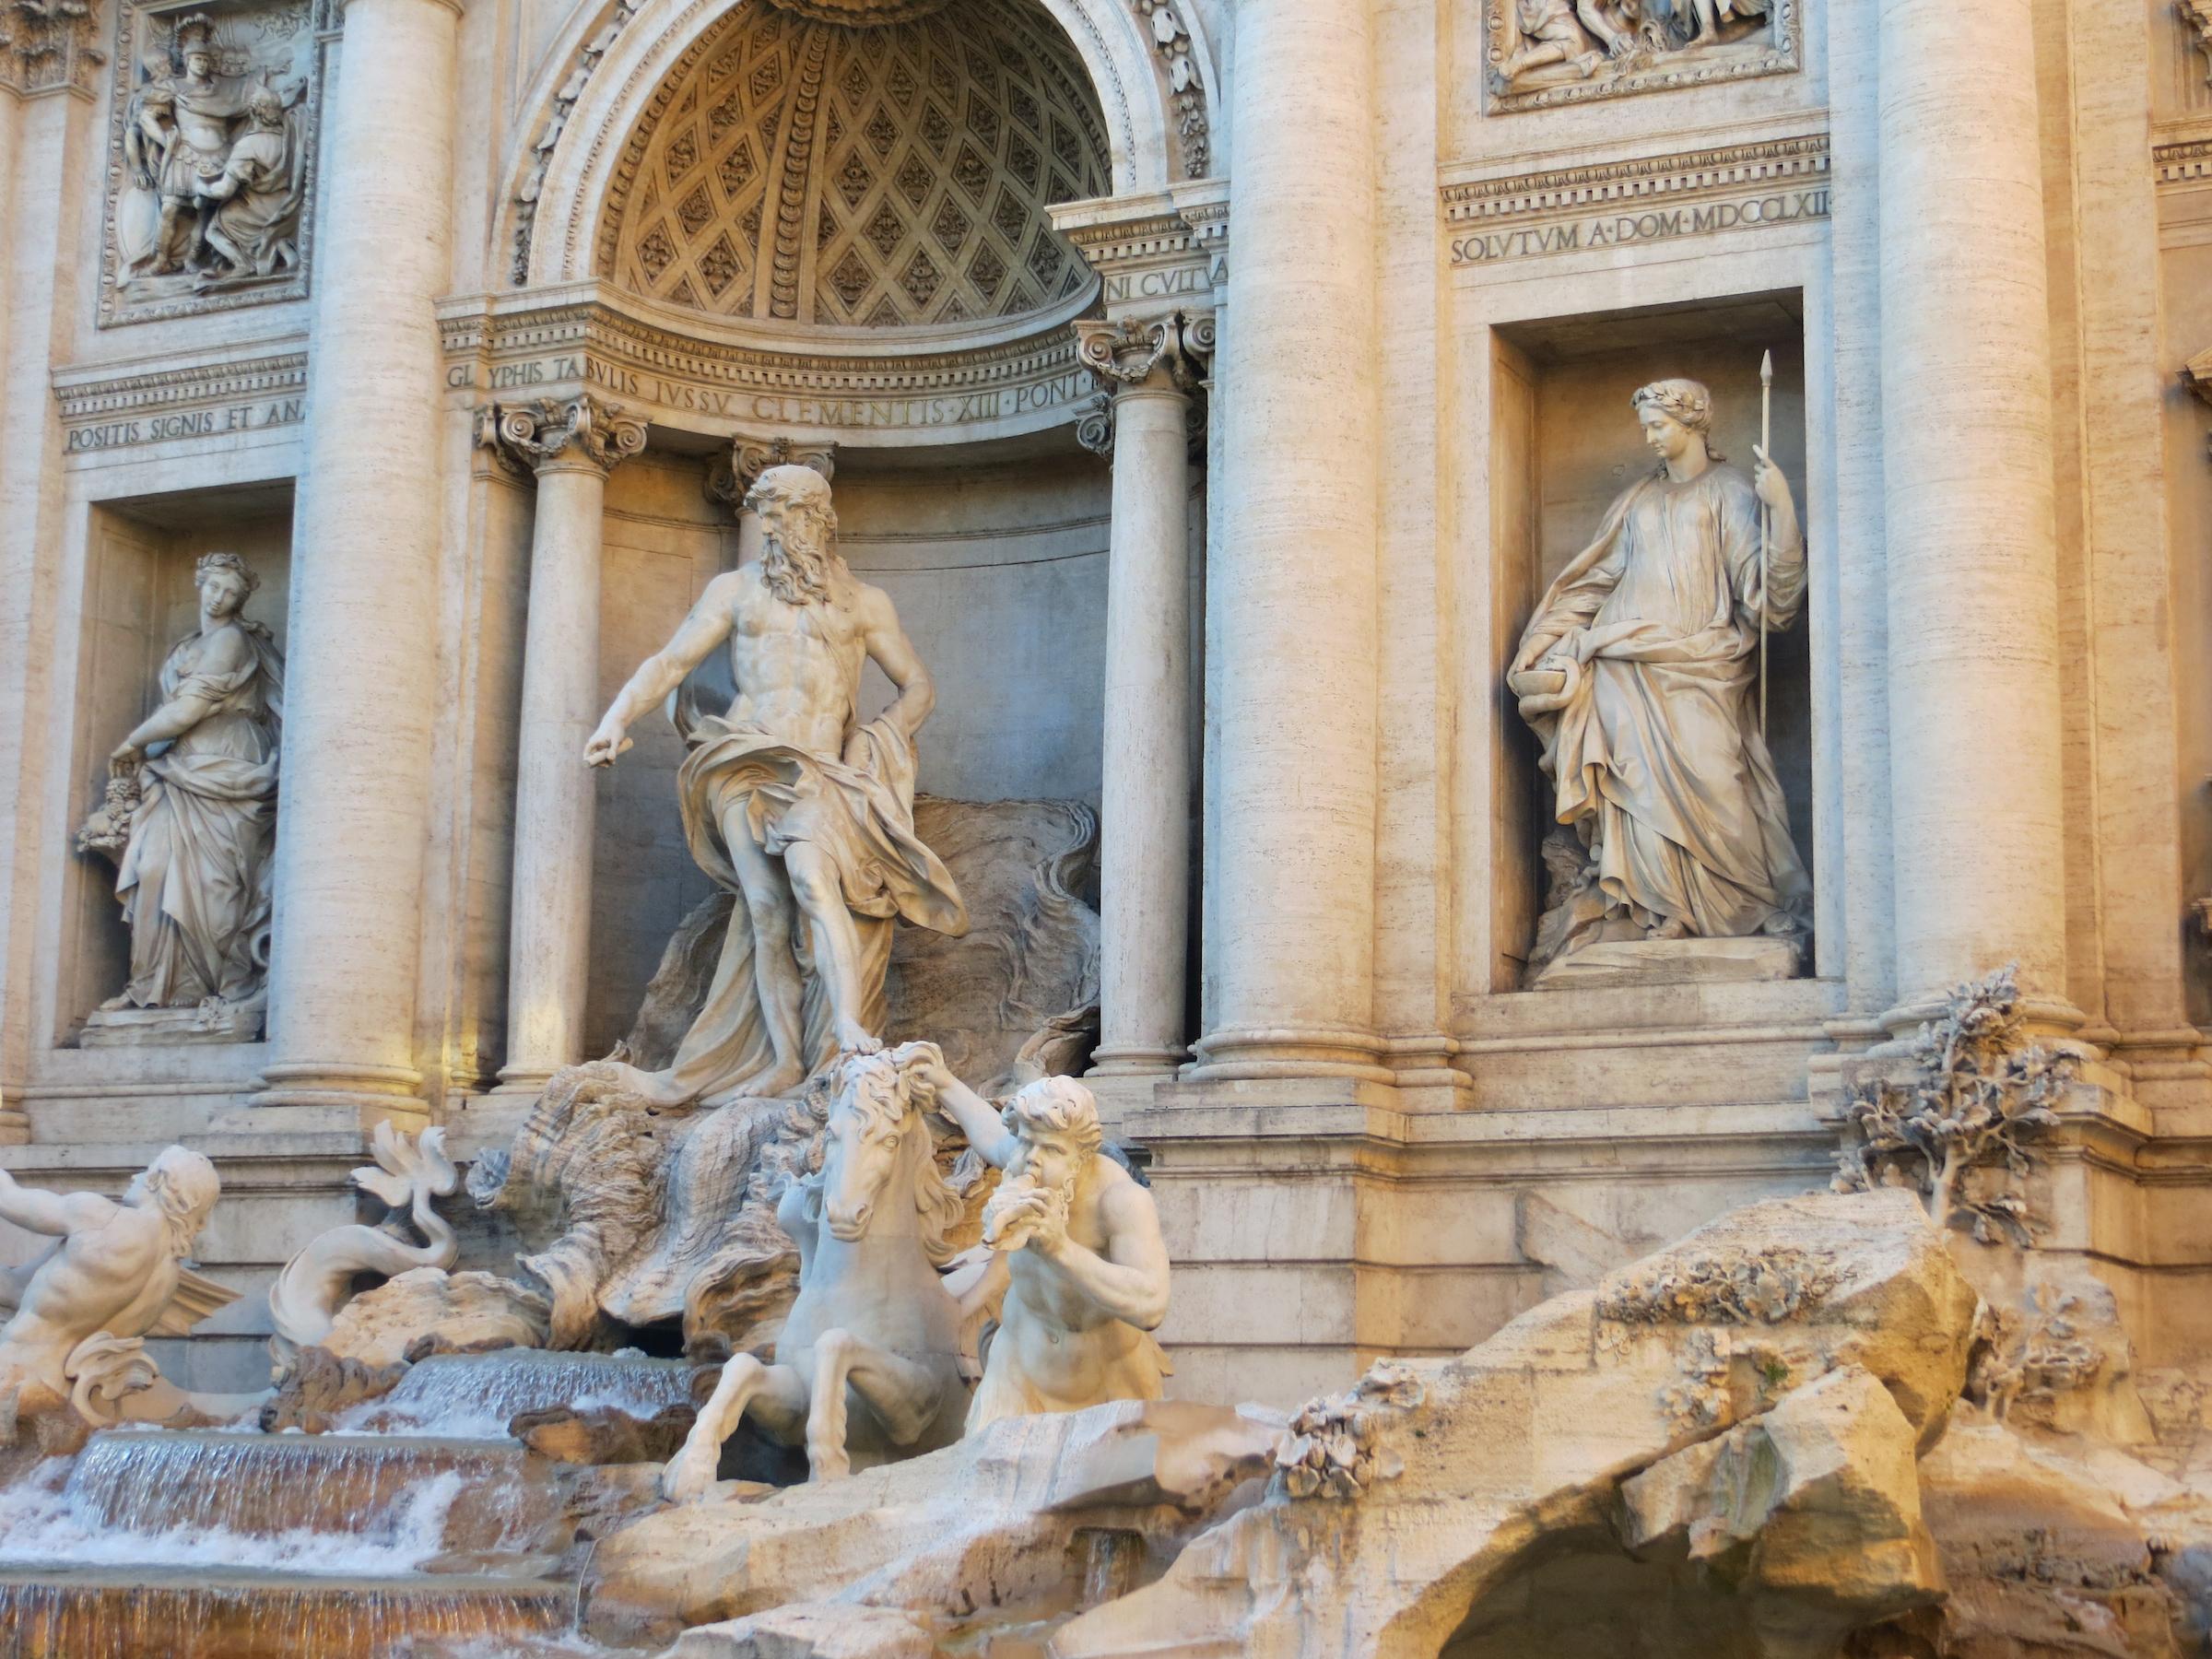 Europe_Rome Trevi Fountain 5.jpg